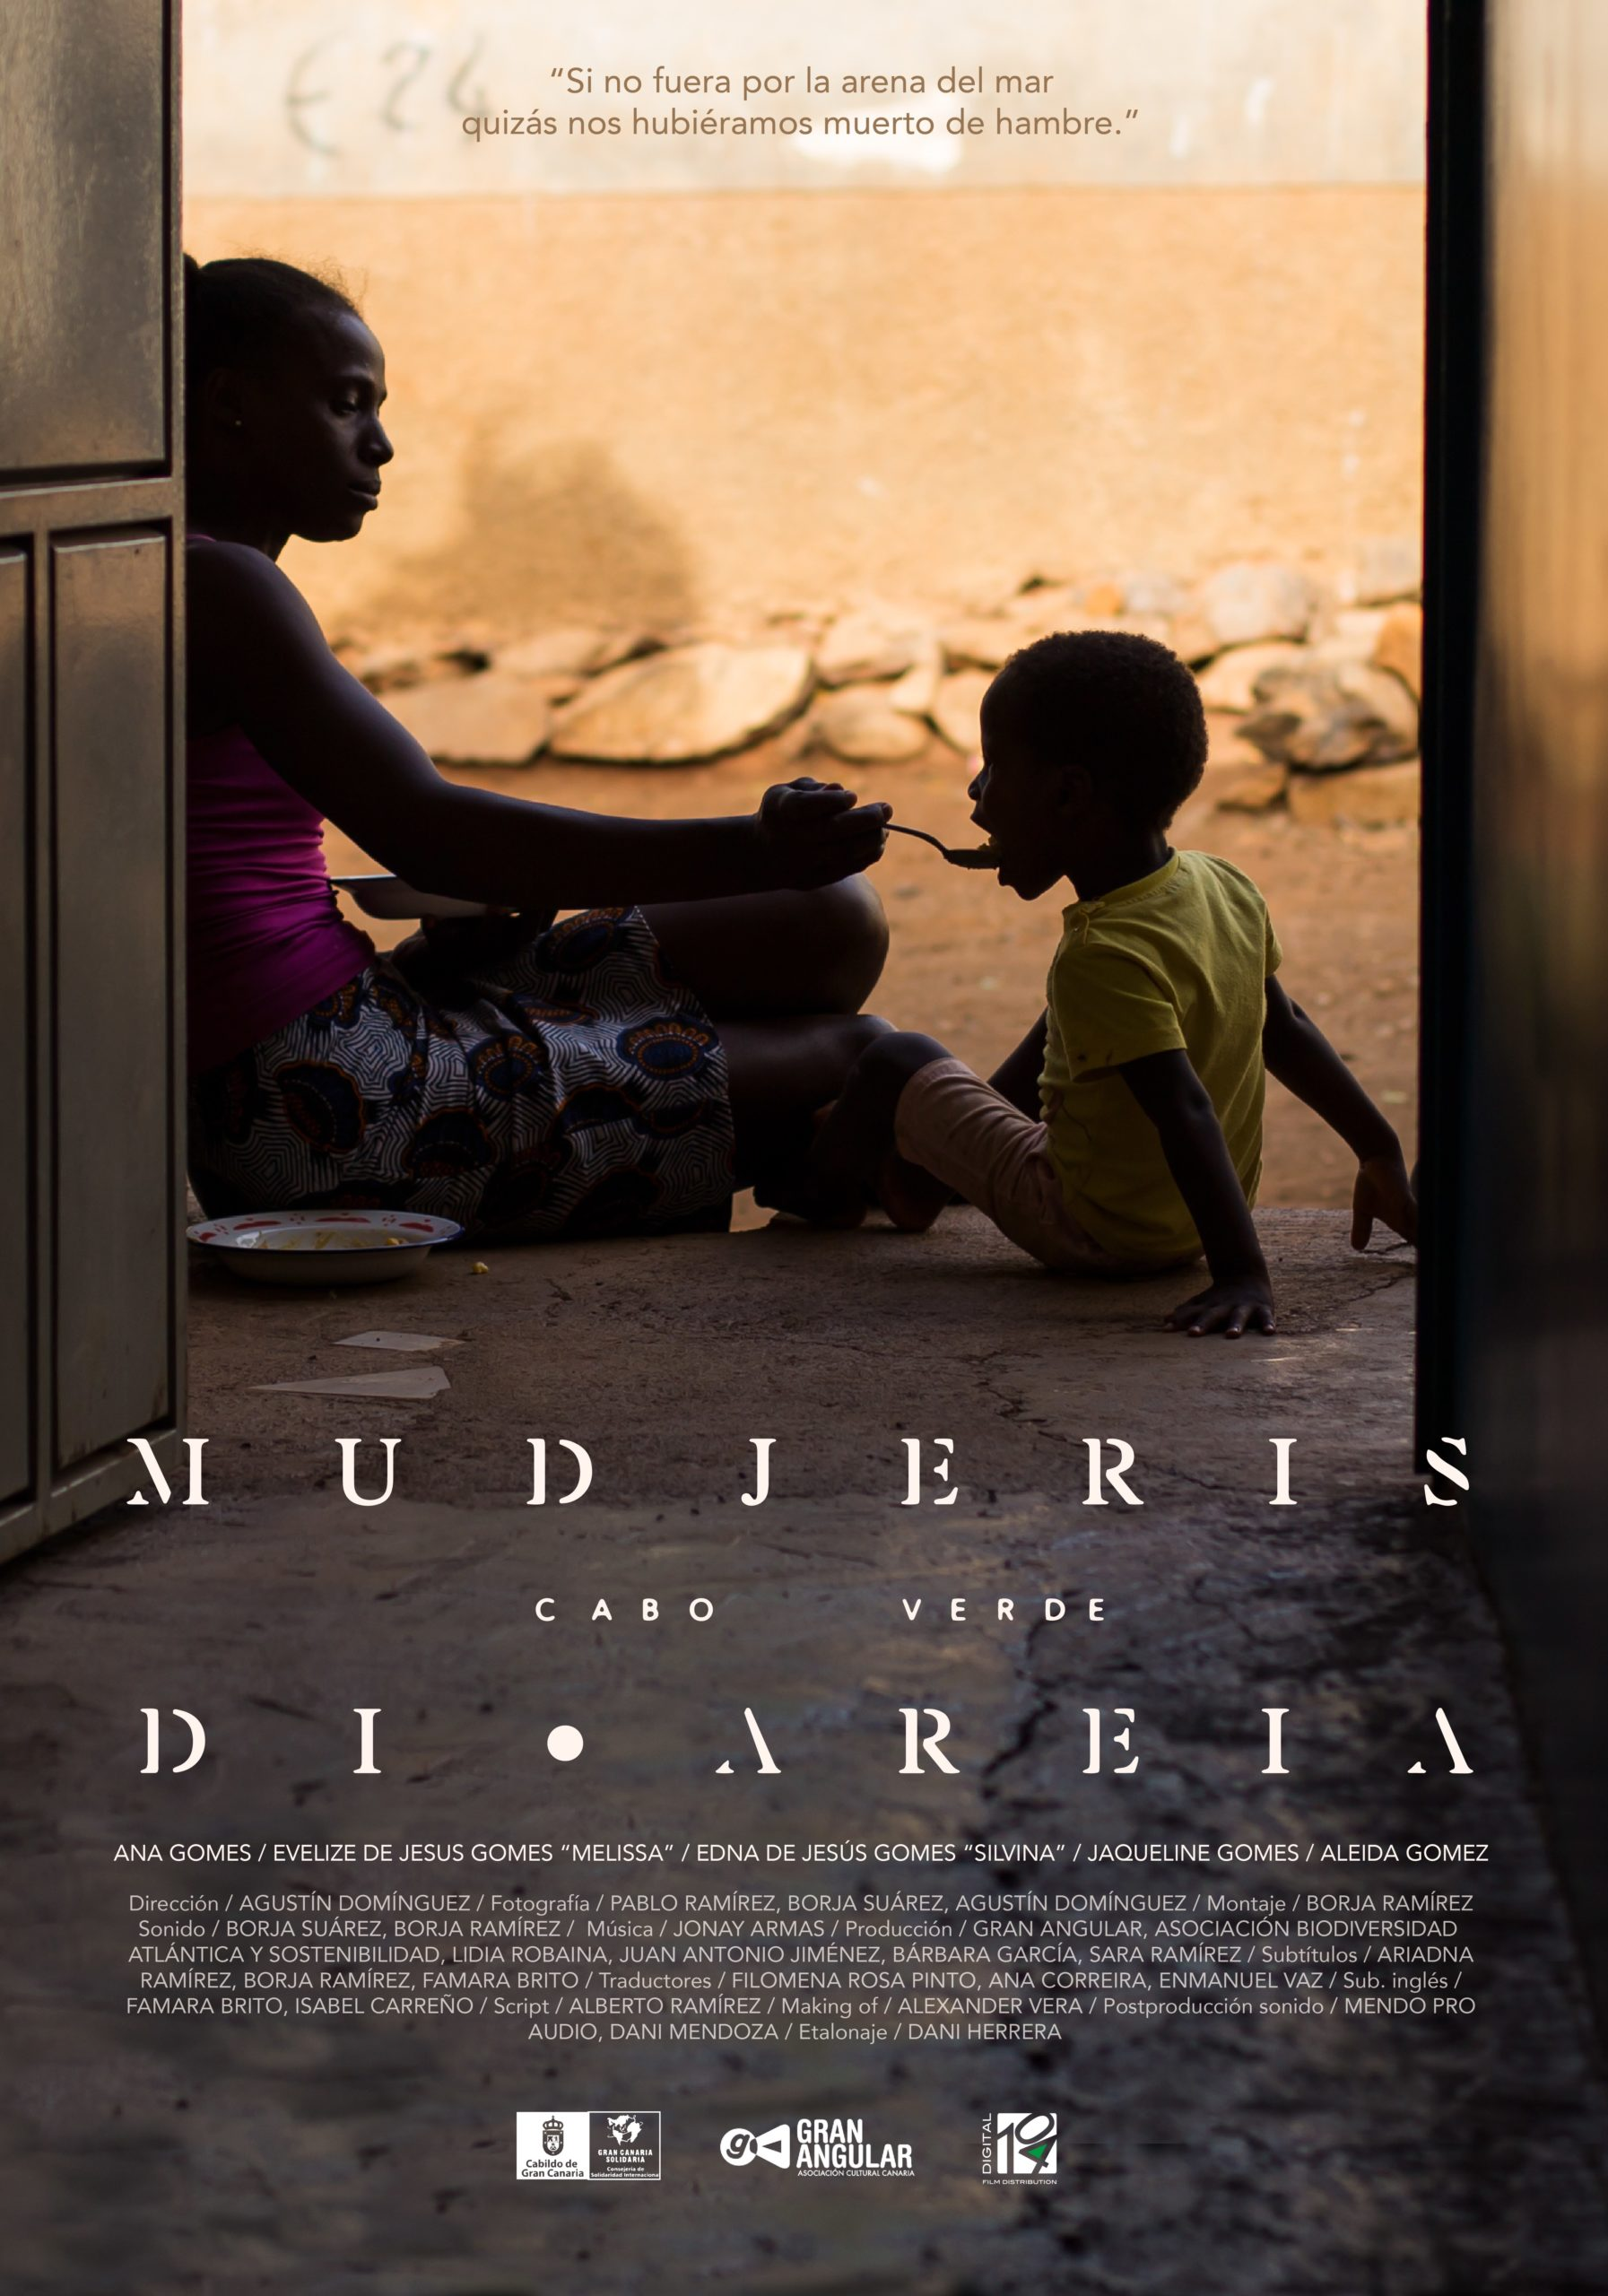 MUDJERIS DI AREIA - - Poster Digital 104 Film Distribution